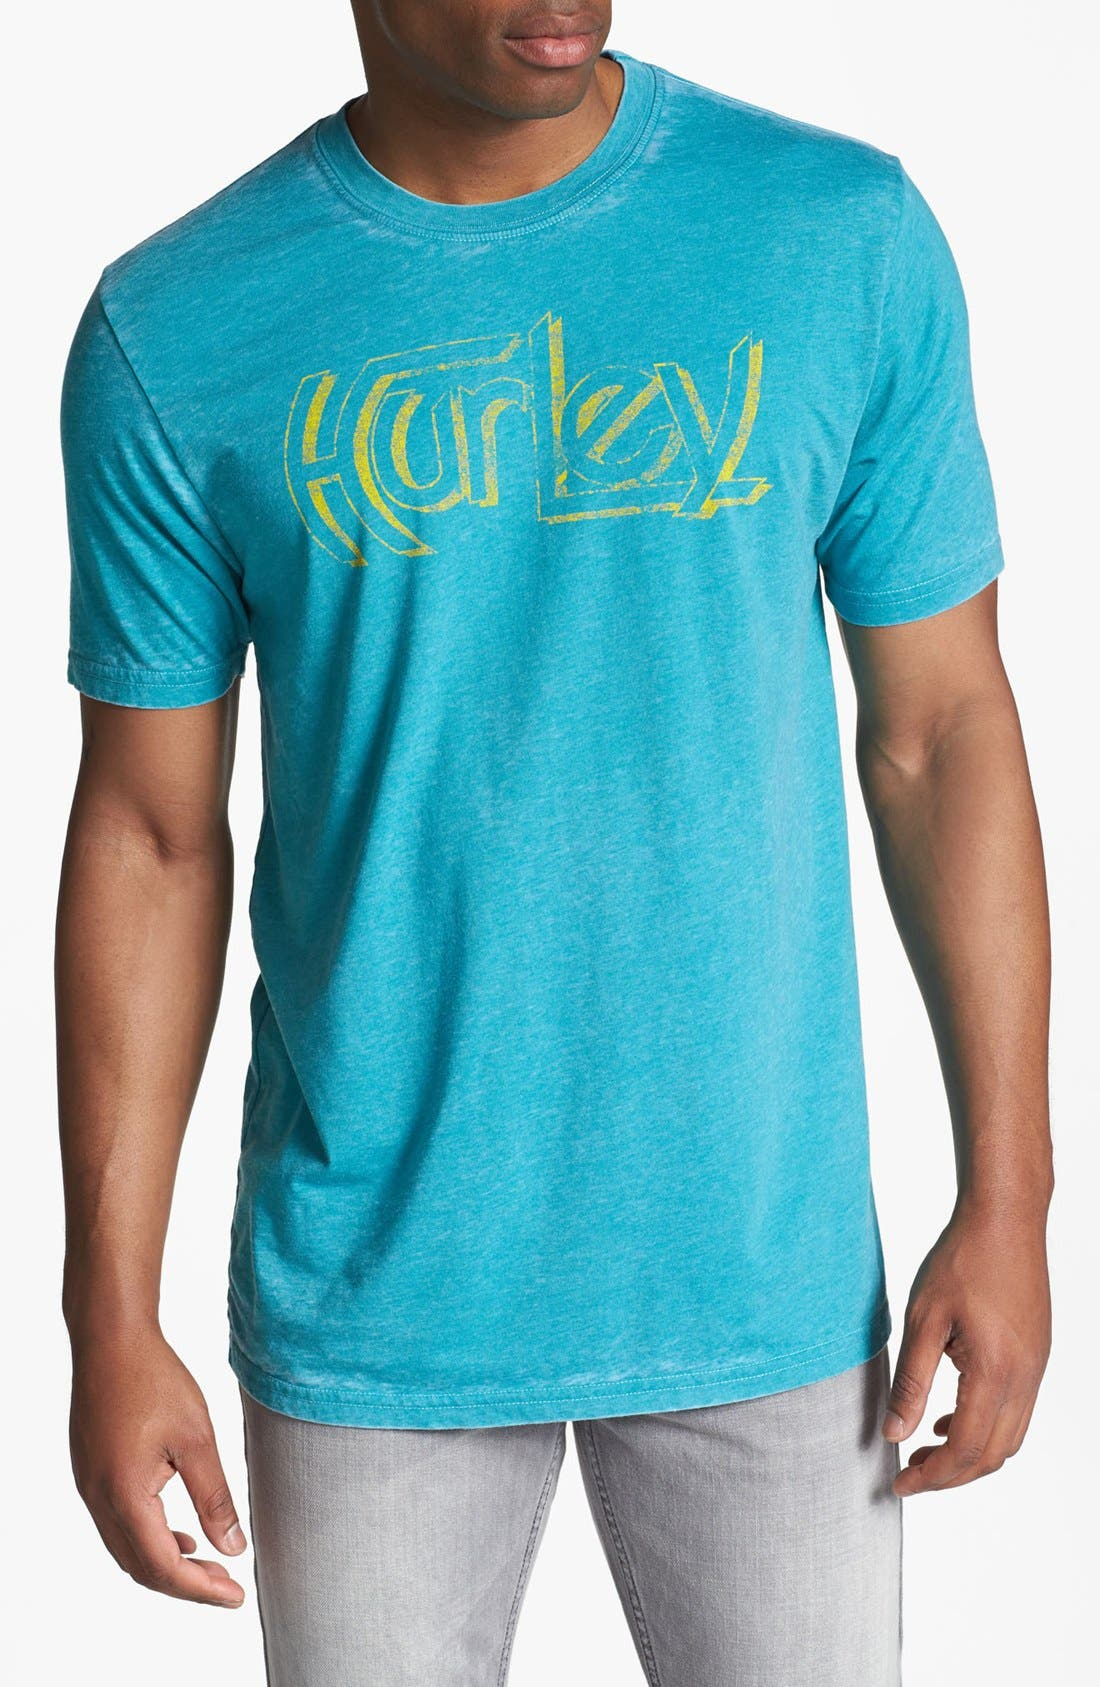 Alternate Image 1 Selected - Hurley Burnout T-Shirt